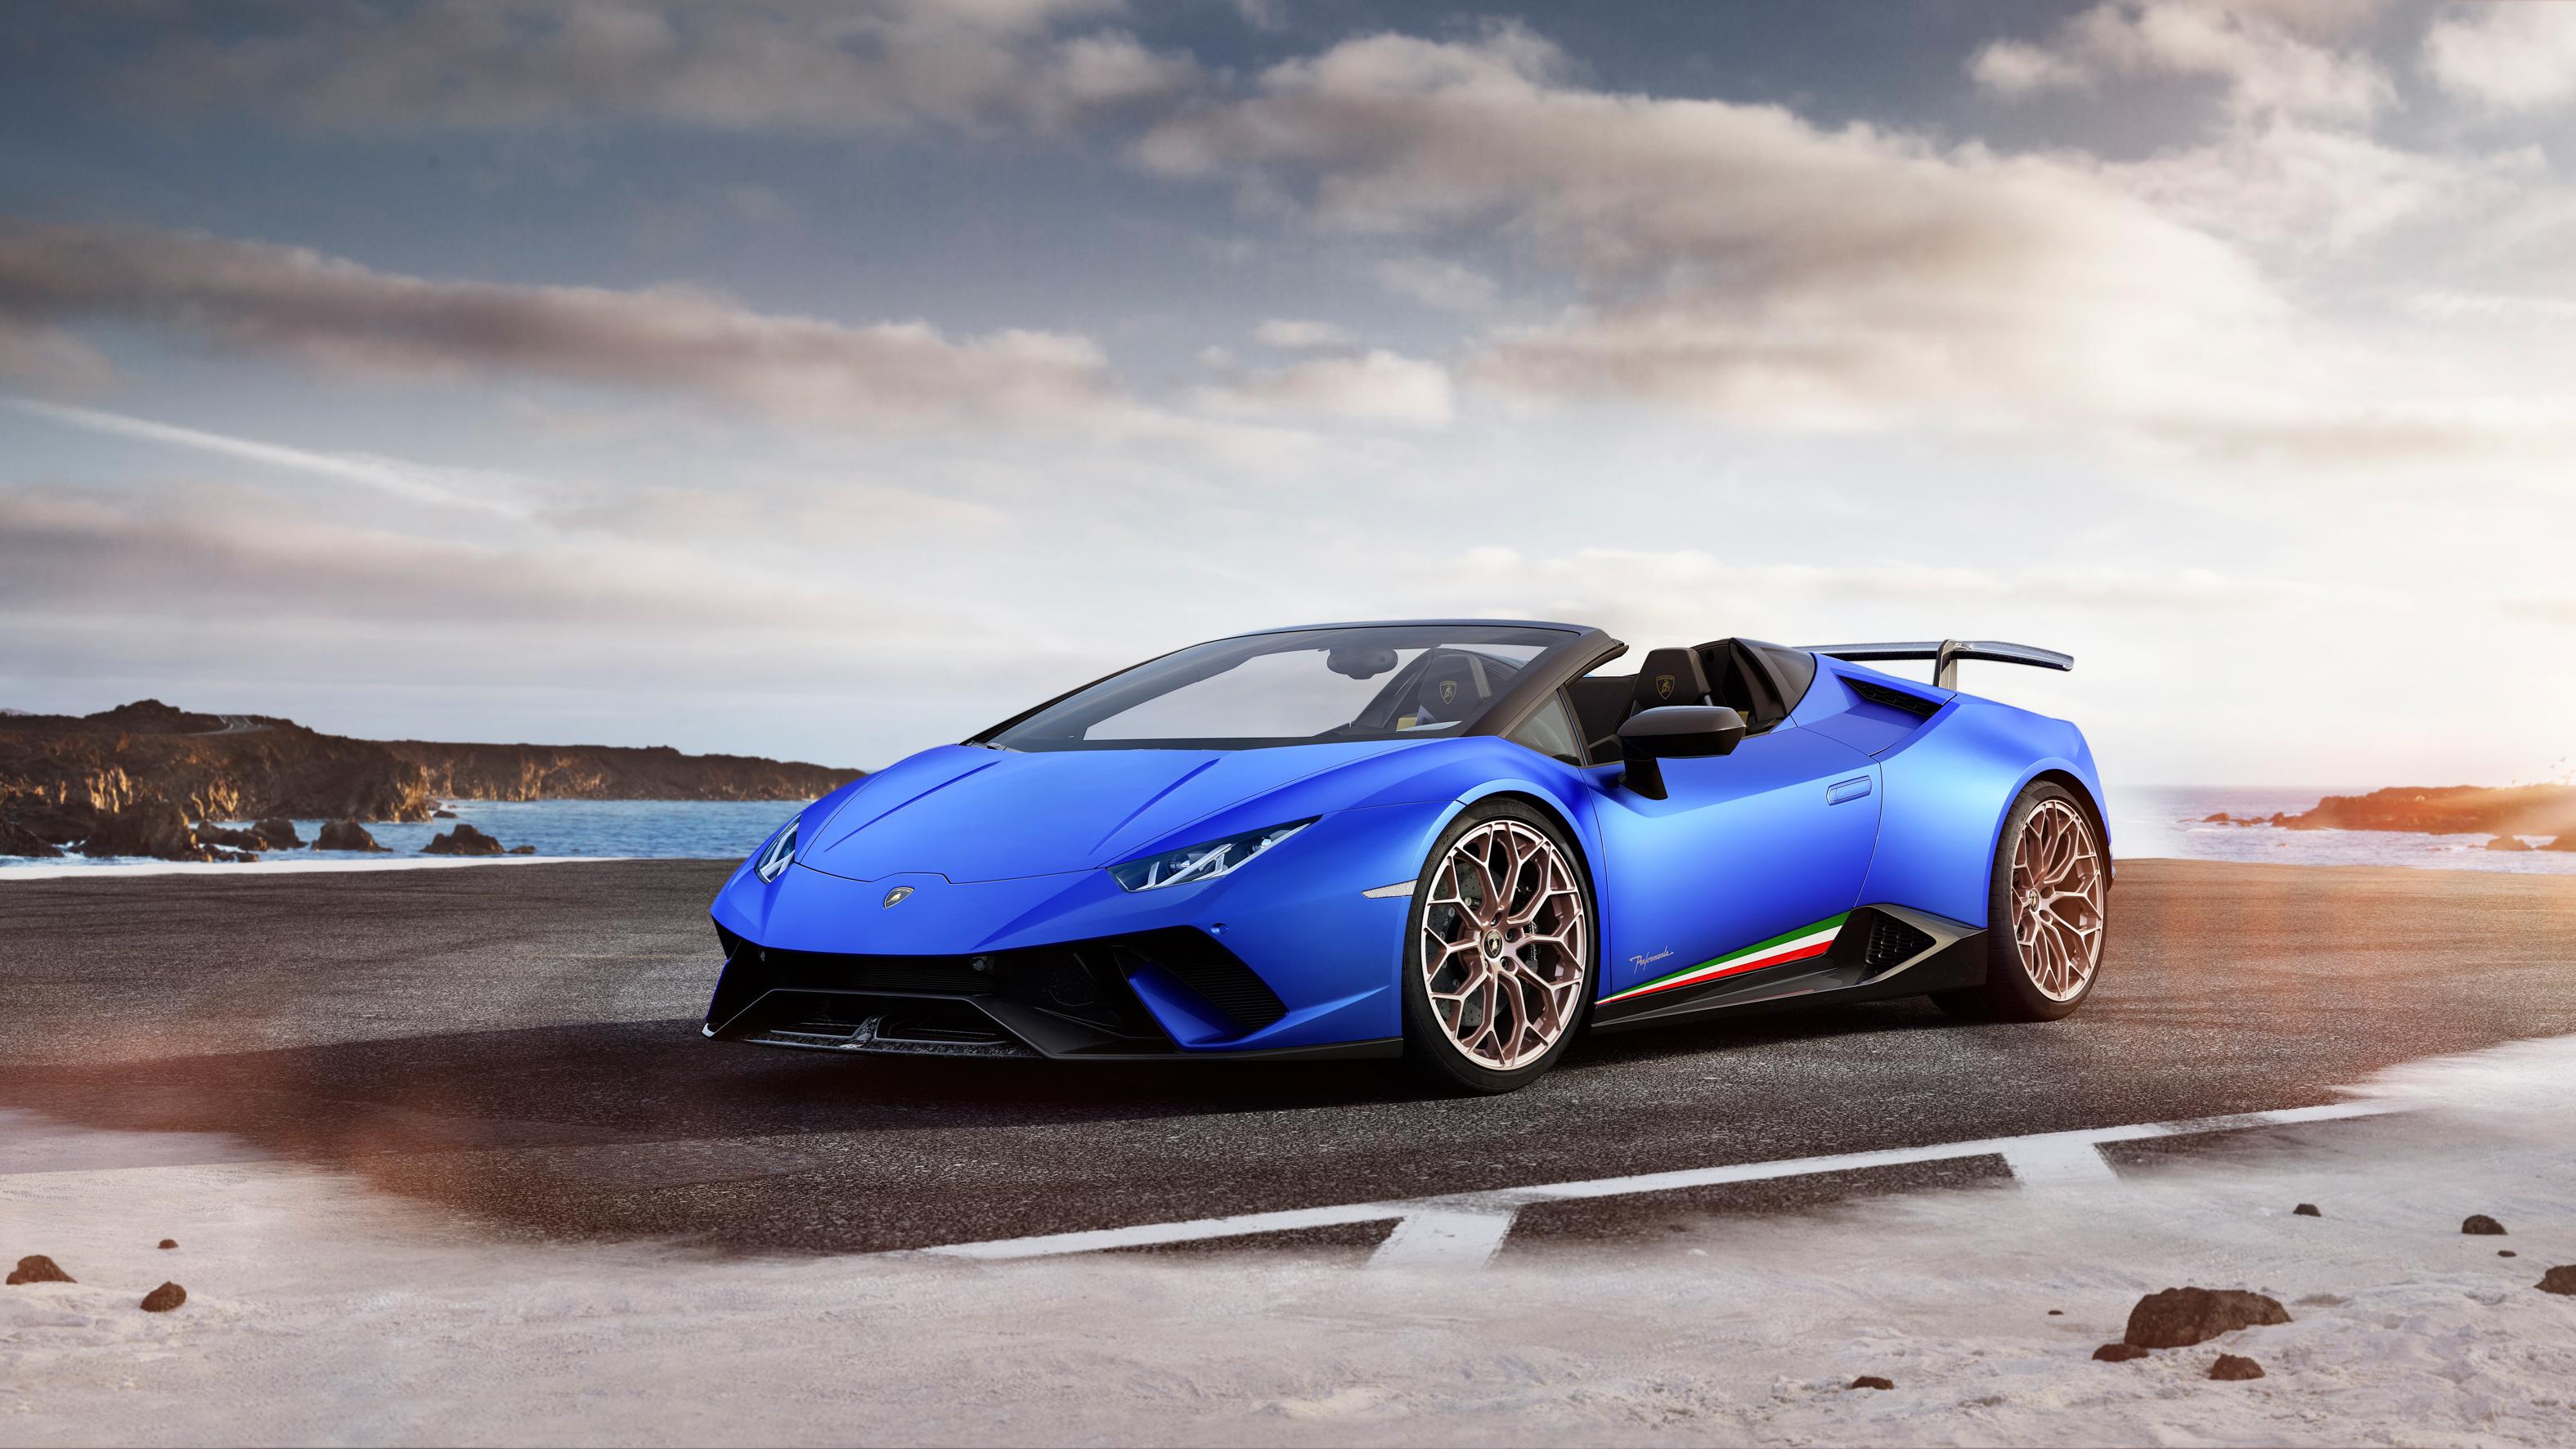 2018 Lamborghini Huracan Perfomante Spyder 6 Wallpaper ...